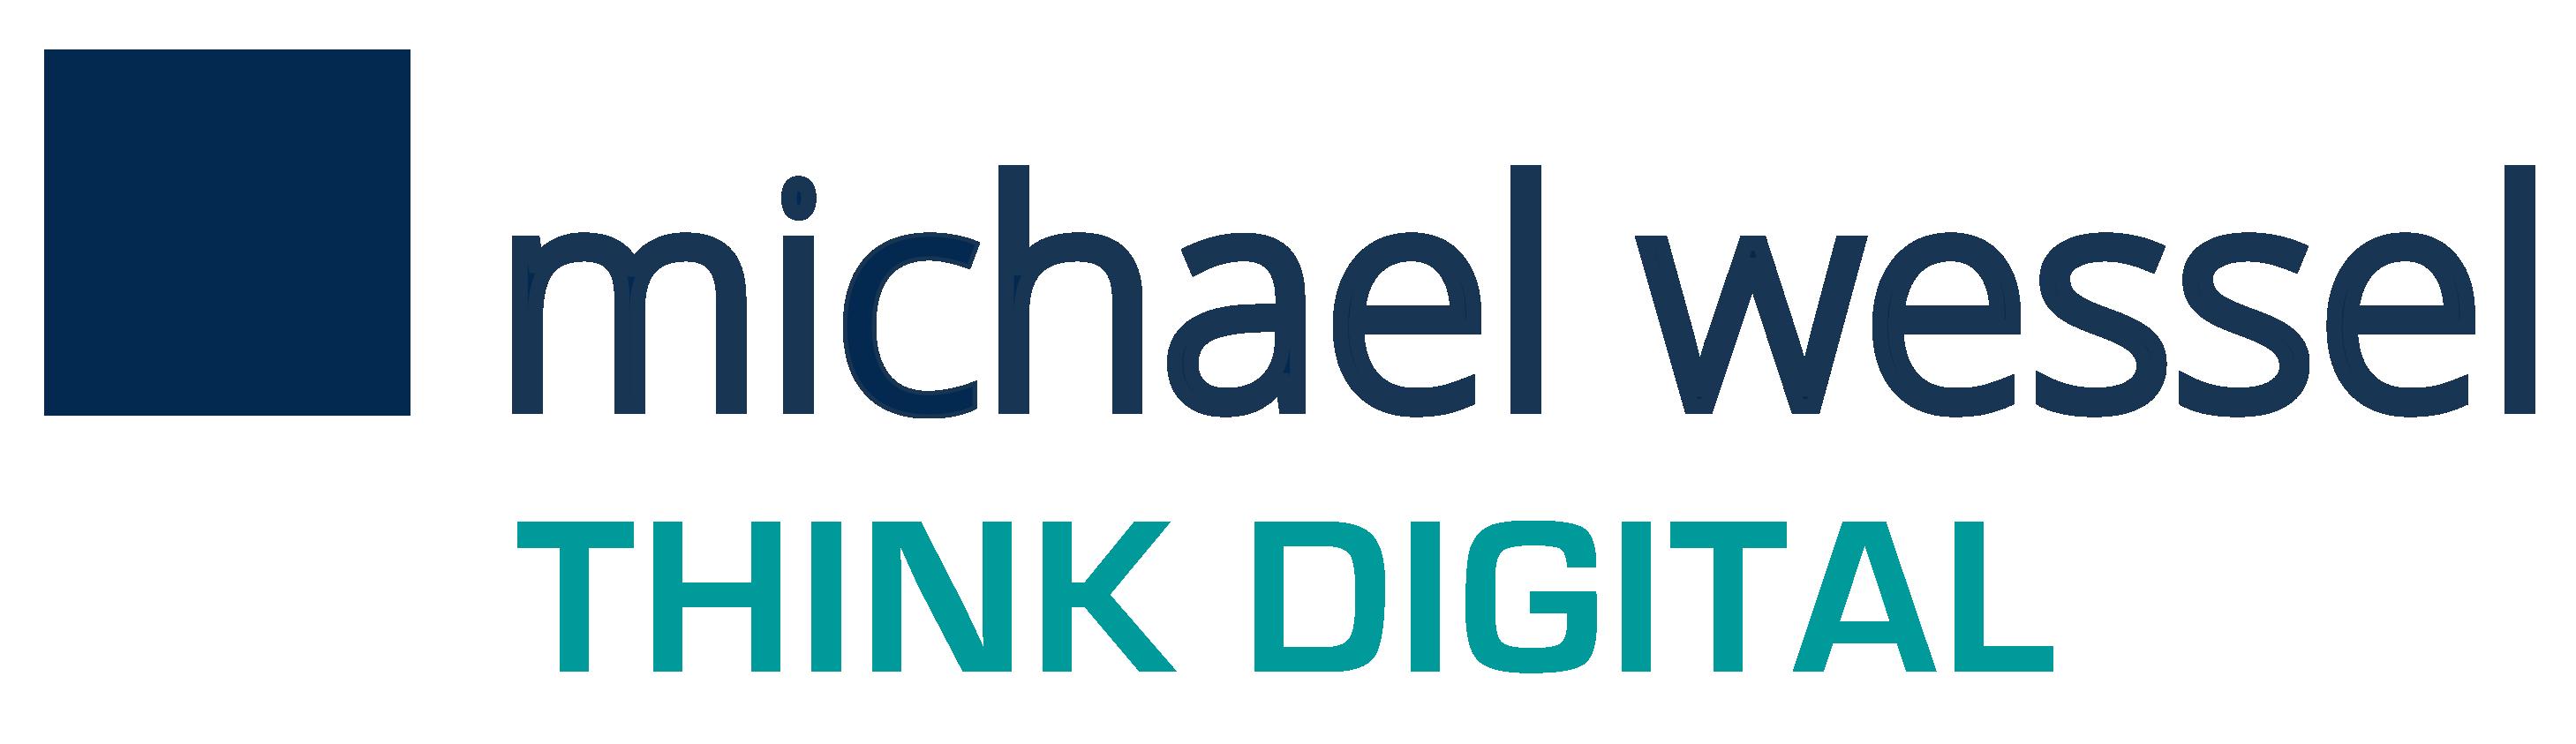 Logo michael wessel